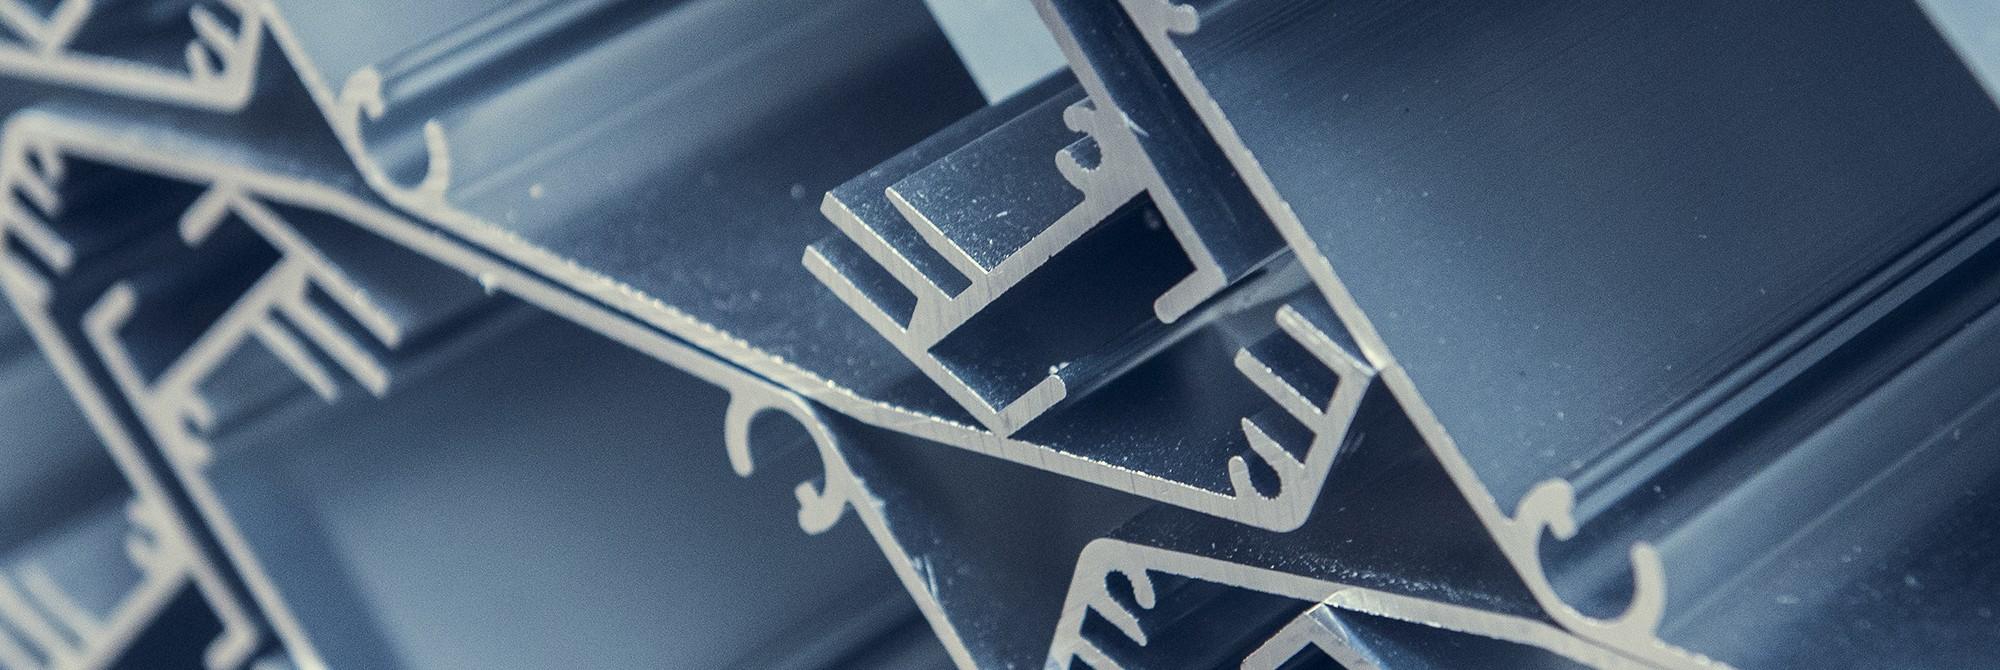 Aluminium maatwerk extrusie tekenprofielen